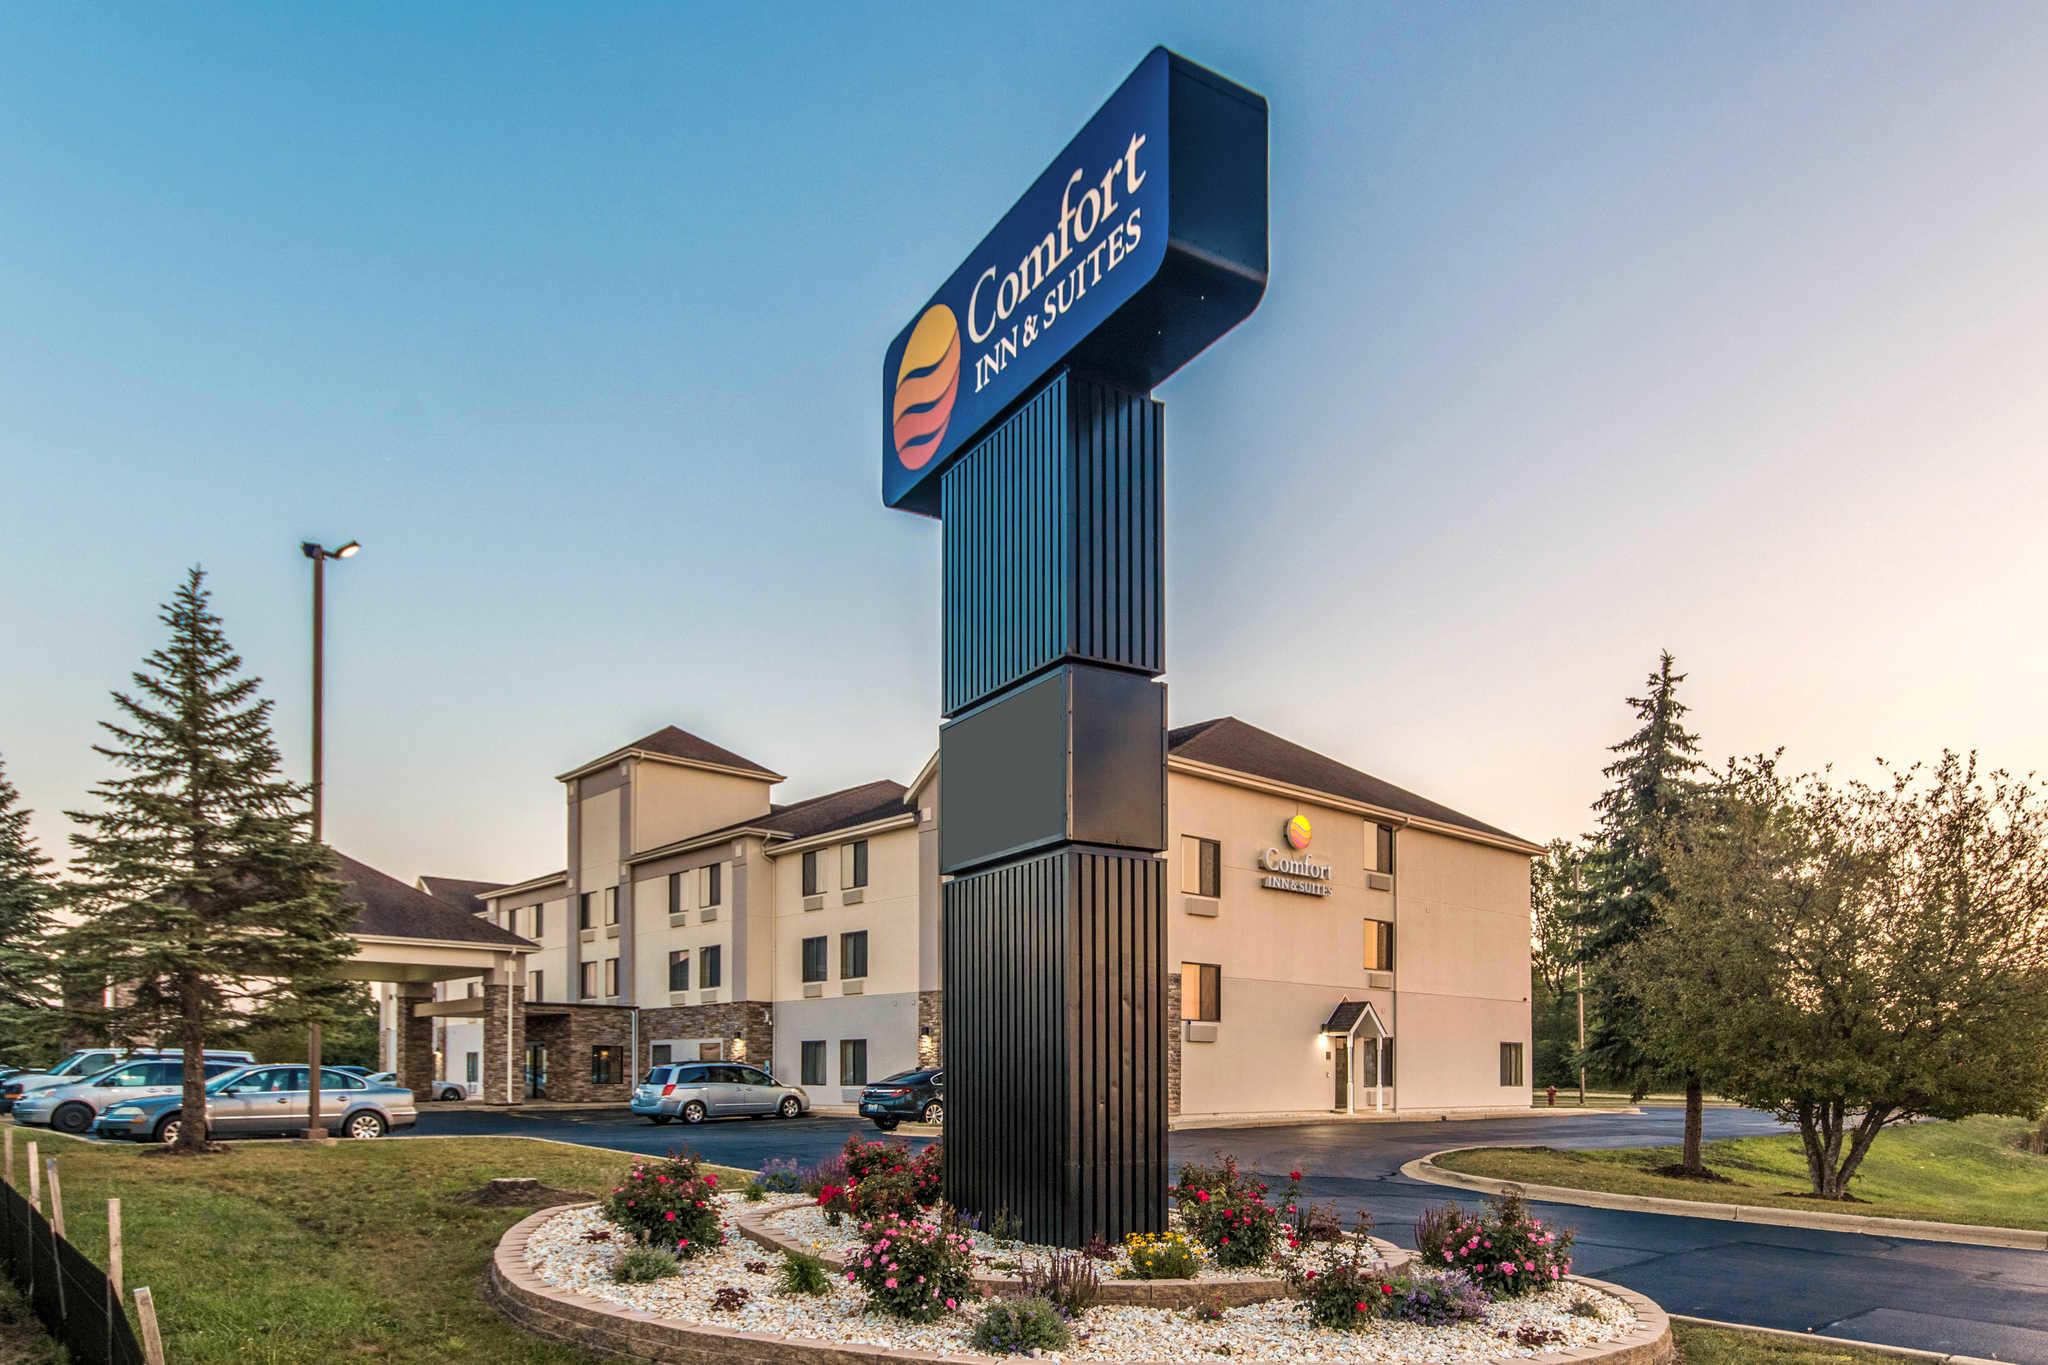 Comfort Inn & Suites North Aurora - Naperville image 0